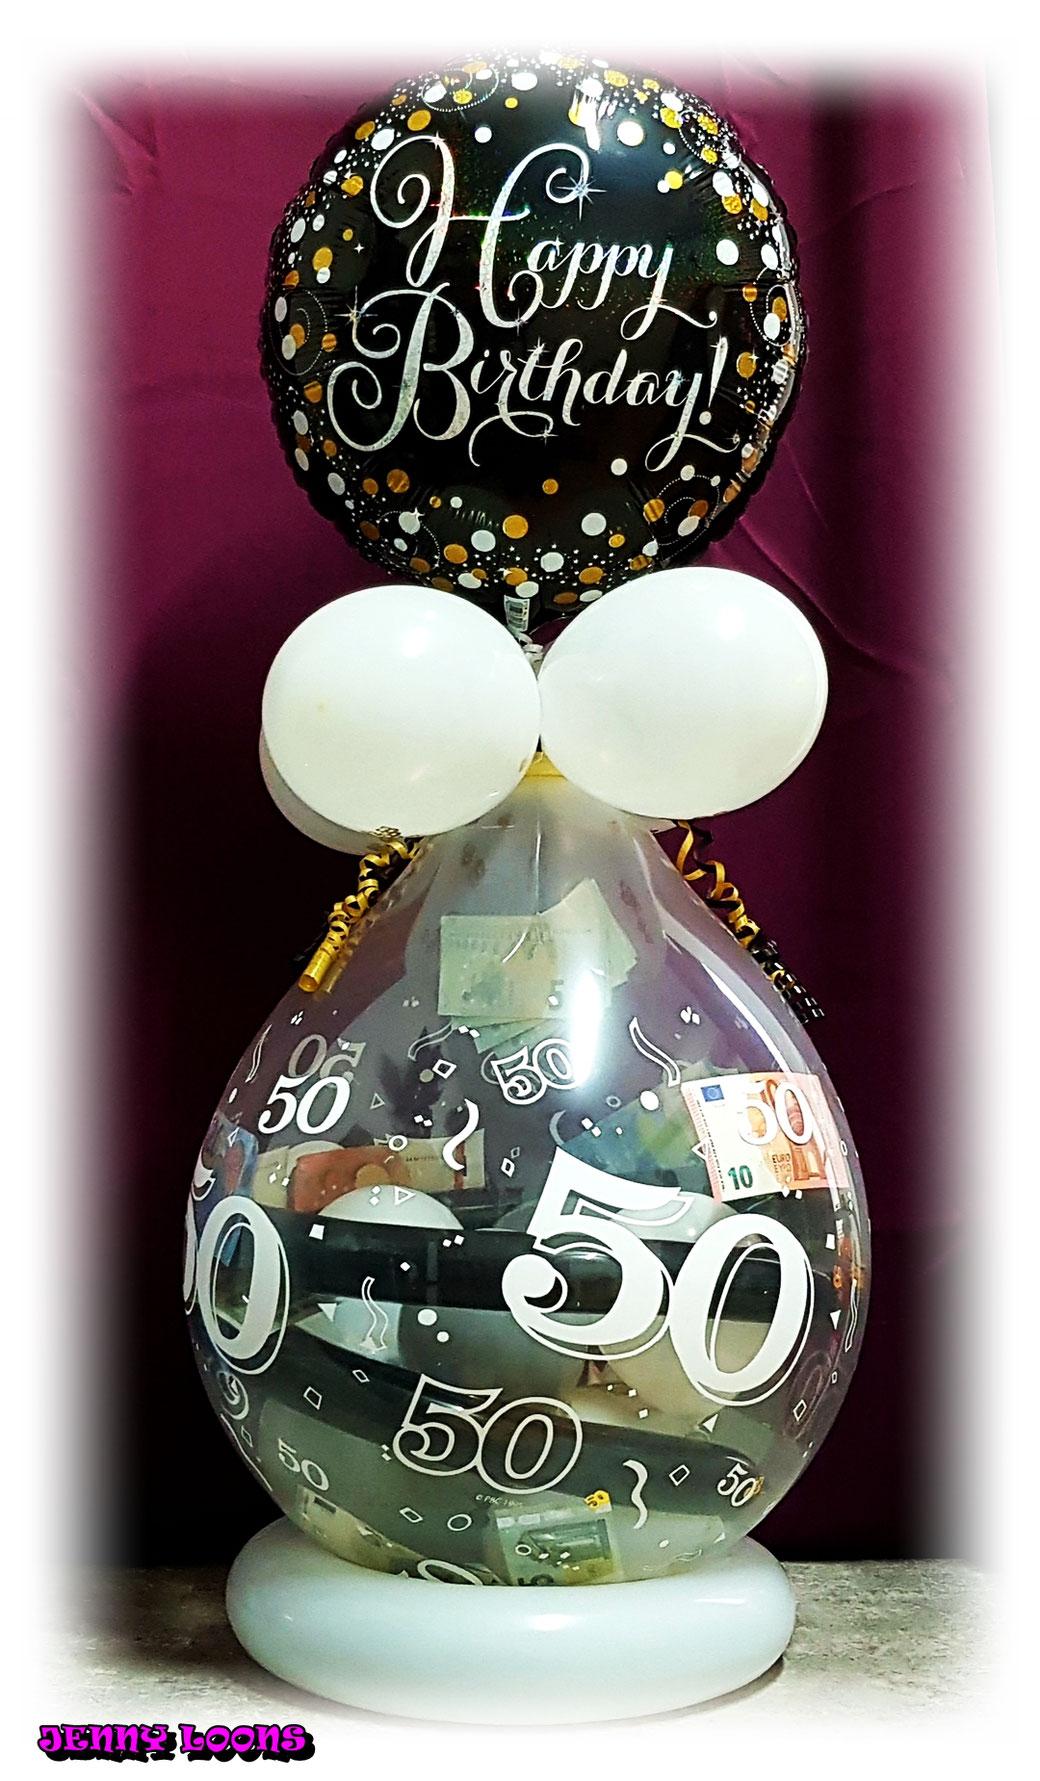 Geschenkballons JENNY LOONS